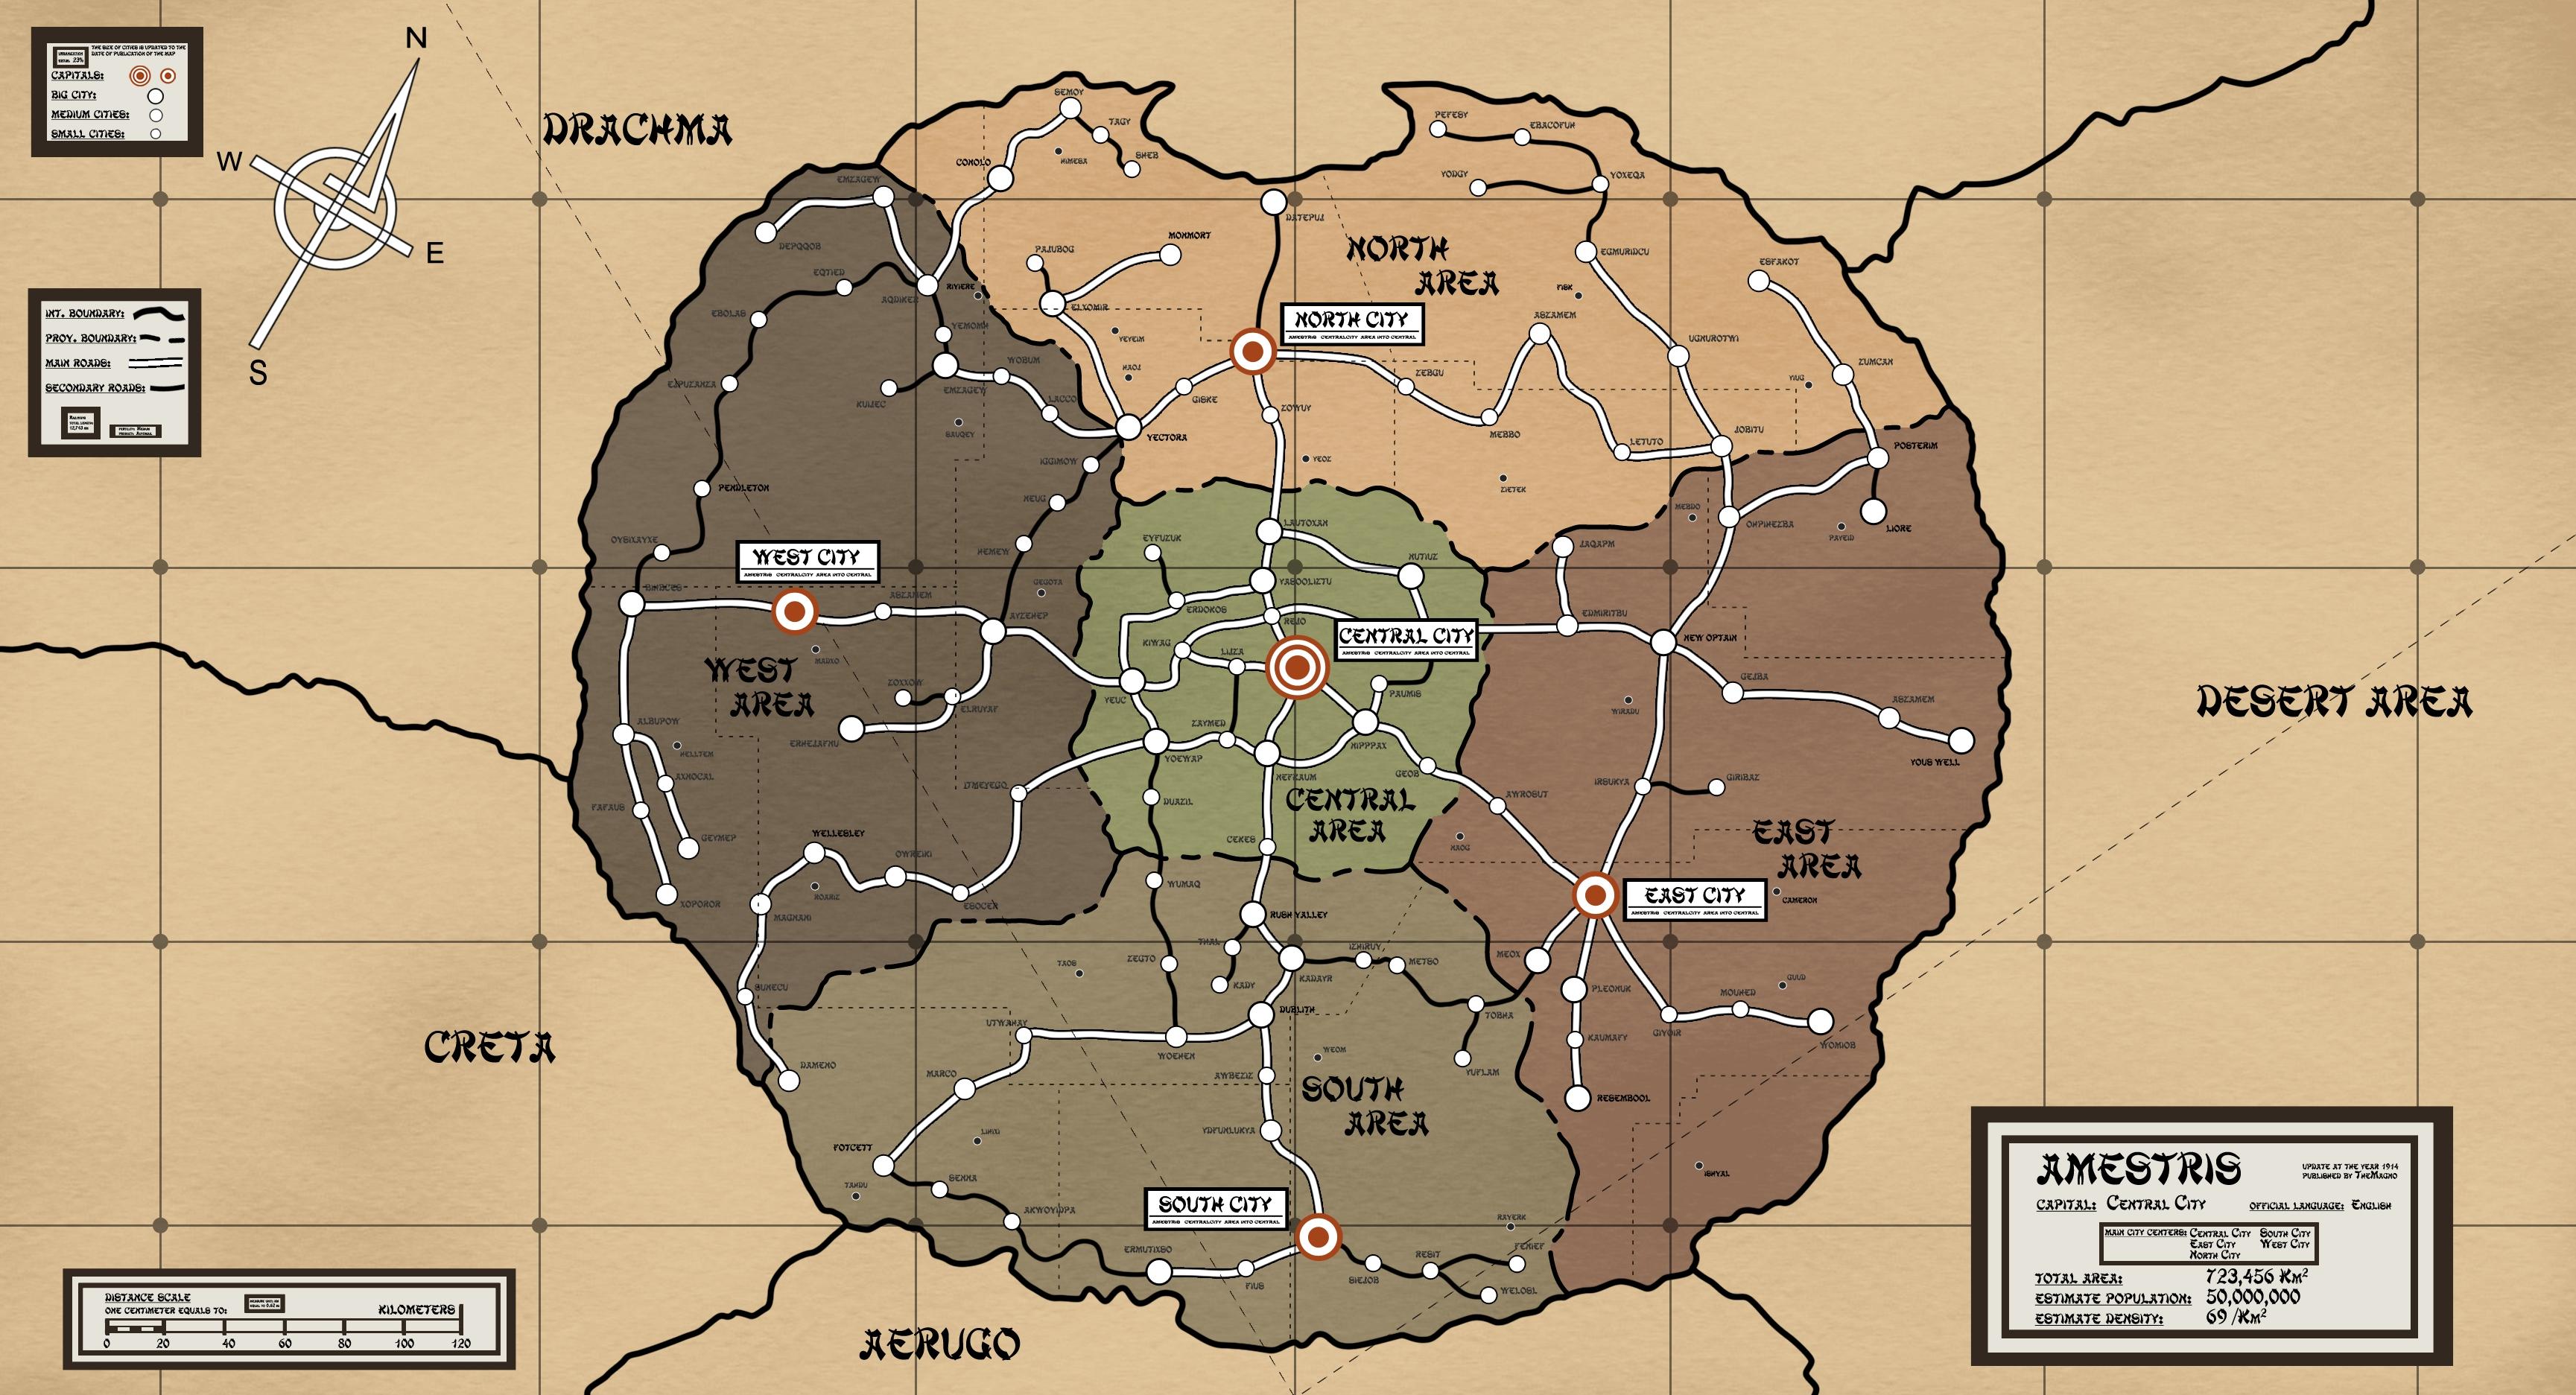 Fullmetal Alchemist Map Image   Amestria map.png | Full Metal Alchemist Fanon Wiki  Fullmetal Alchemist Map